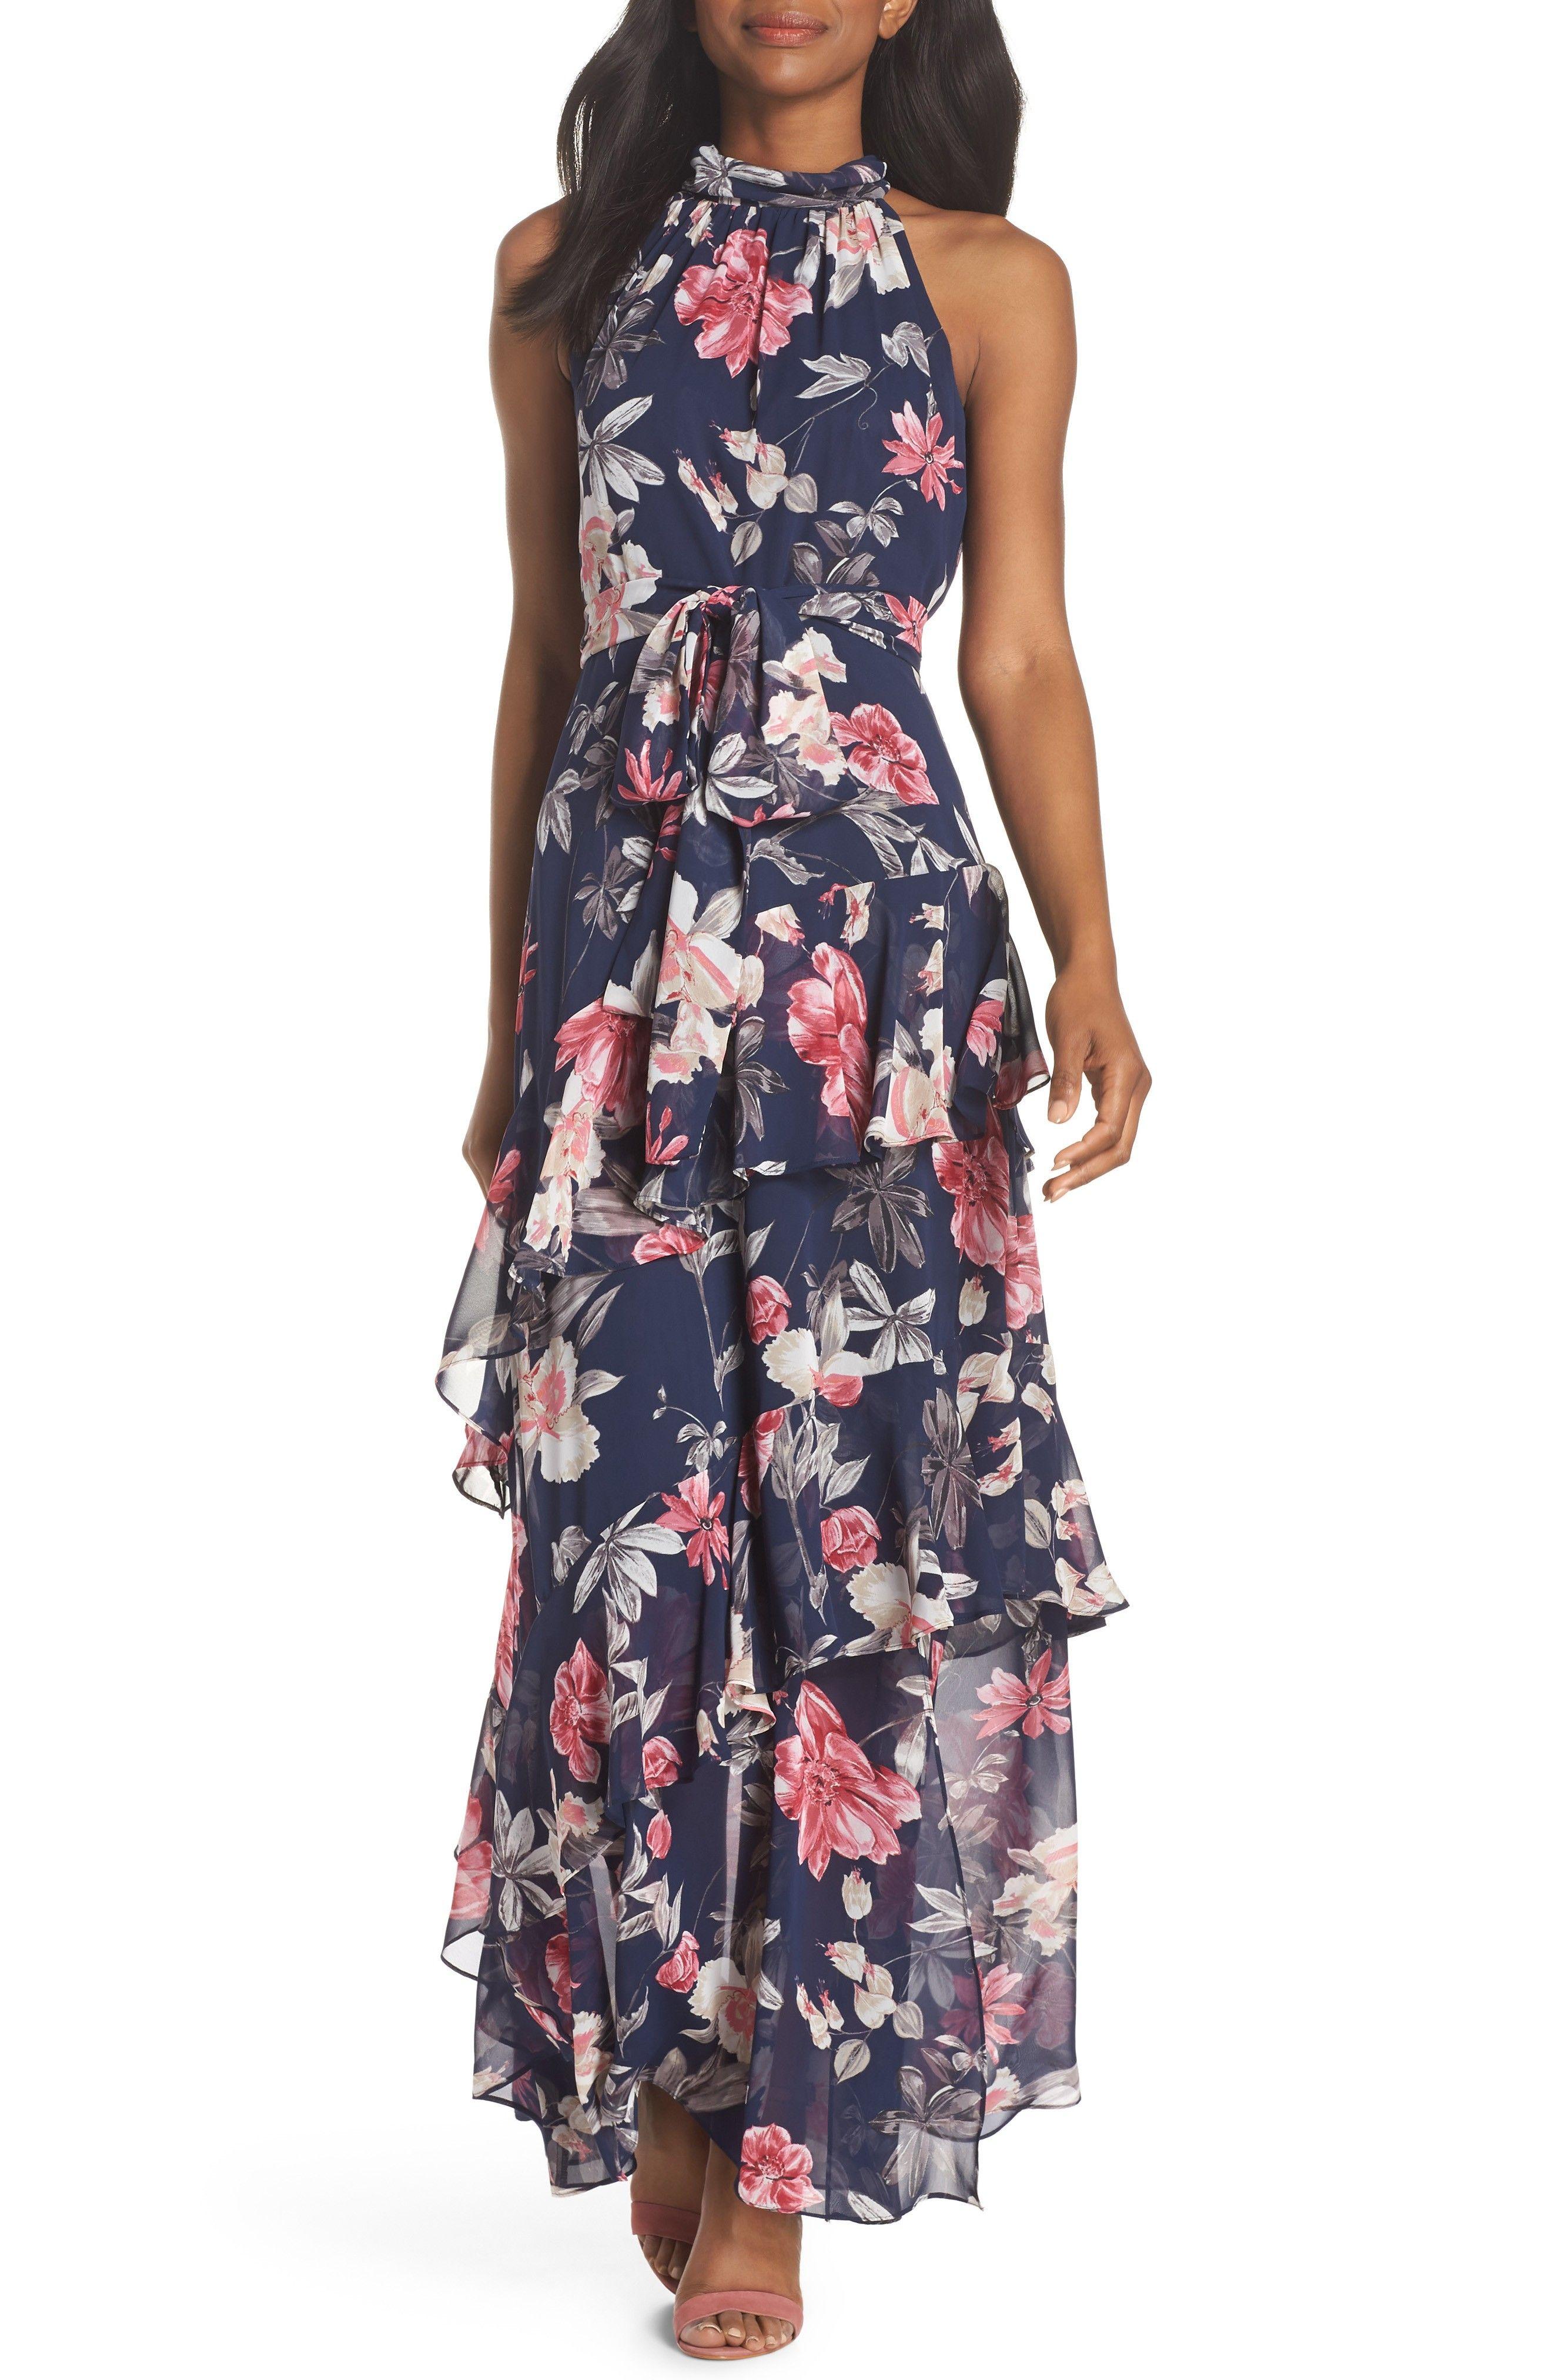 The Best Maxi Dresses For Spring Halter Neck Ruffle Chiffon Maxi Dressby Eliza J Ad Maxidres Maxi Dress Wedding Wedding Guest Dress Summer Summer Maxi Dress [ 4048 x 2640 Pixel ]